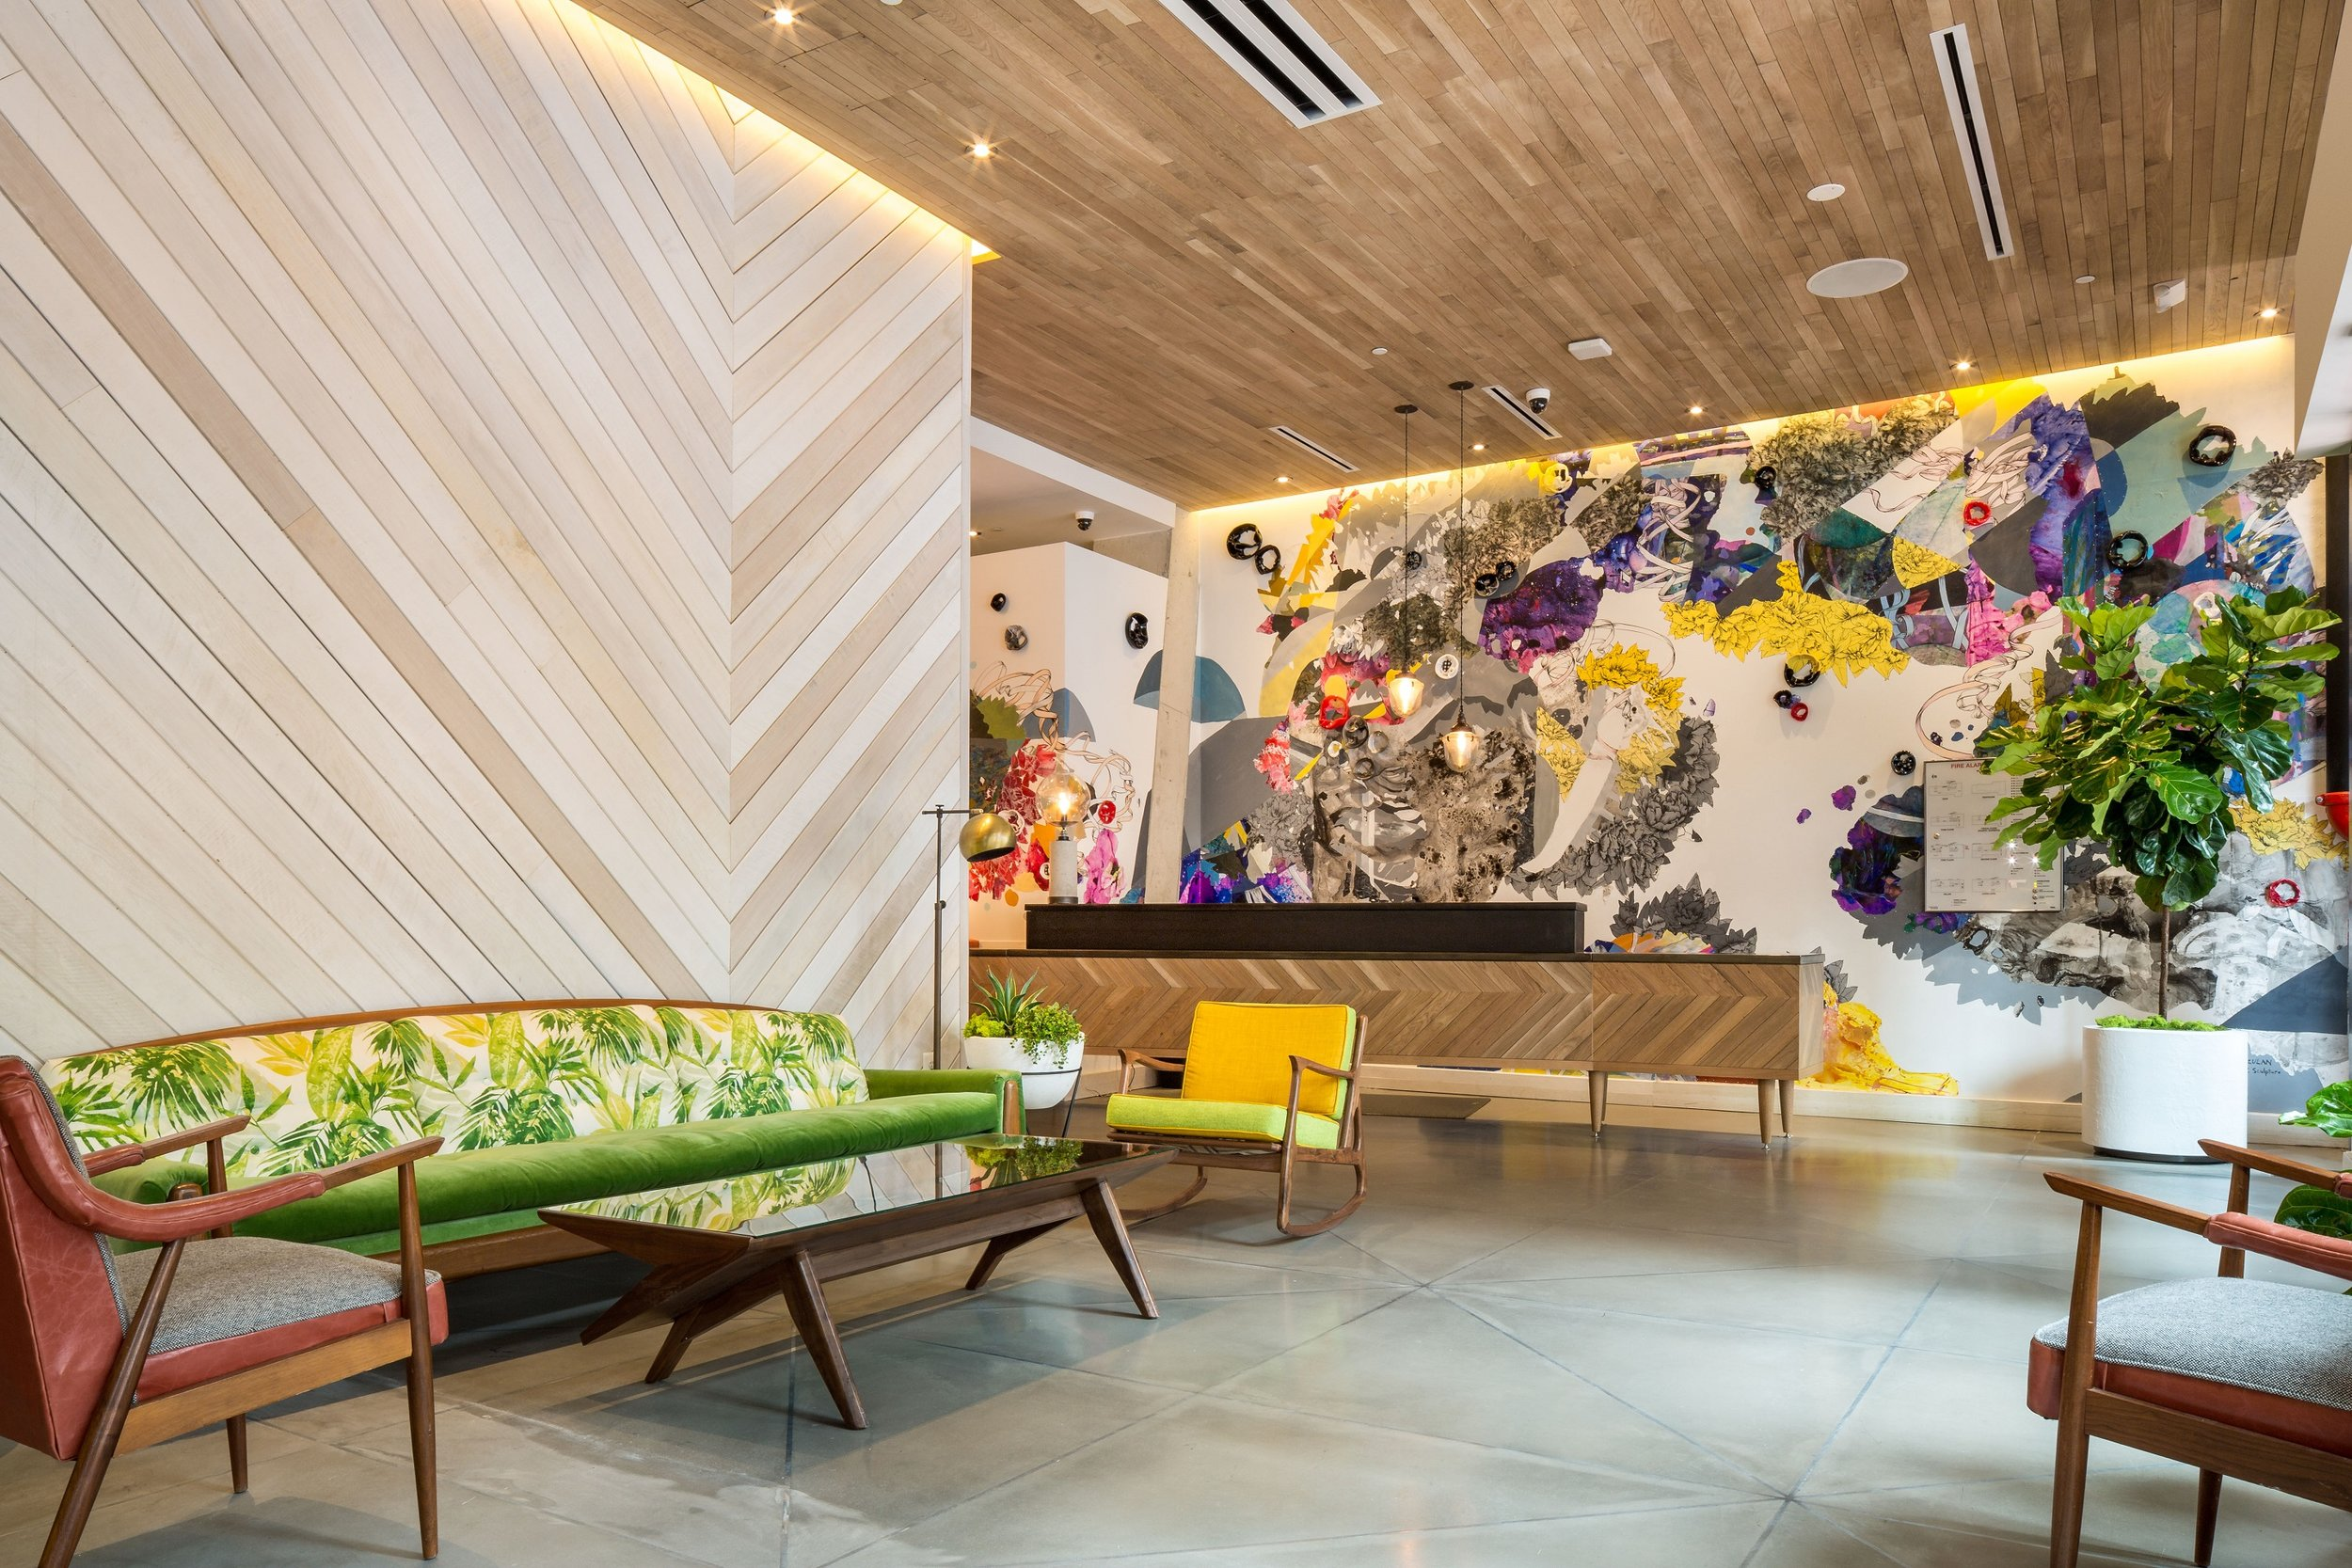 studio-saint-hotels-pod-hotel-washington-dc-6